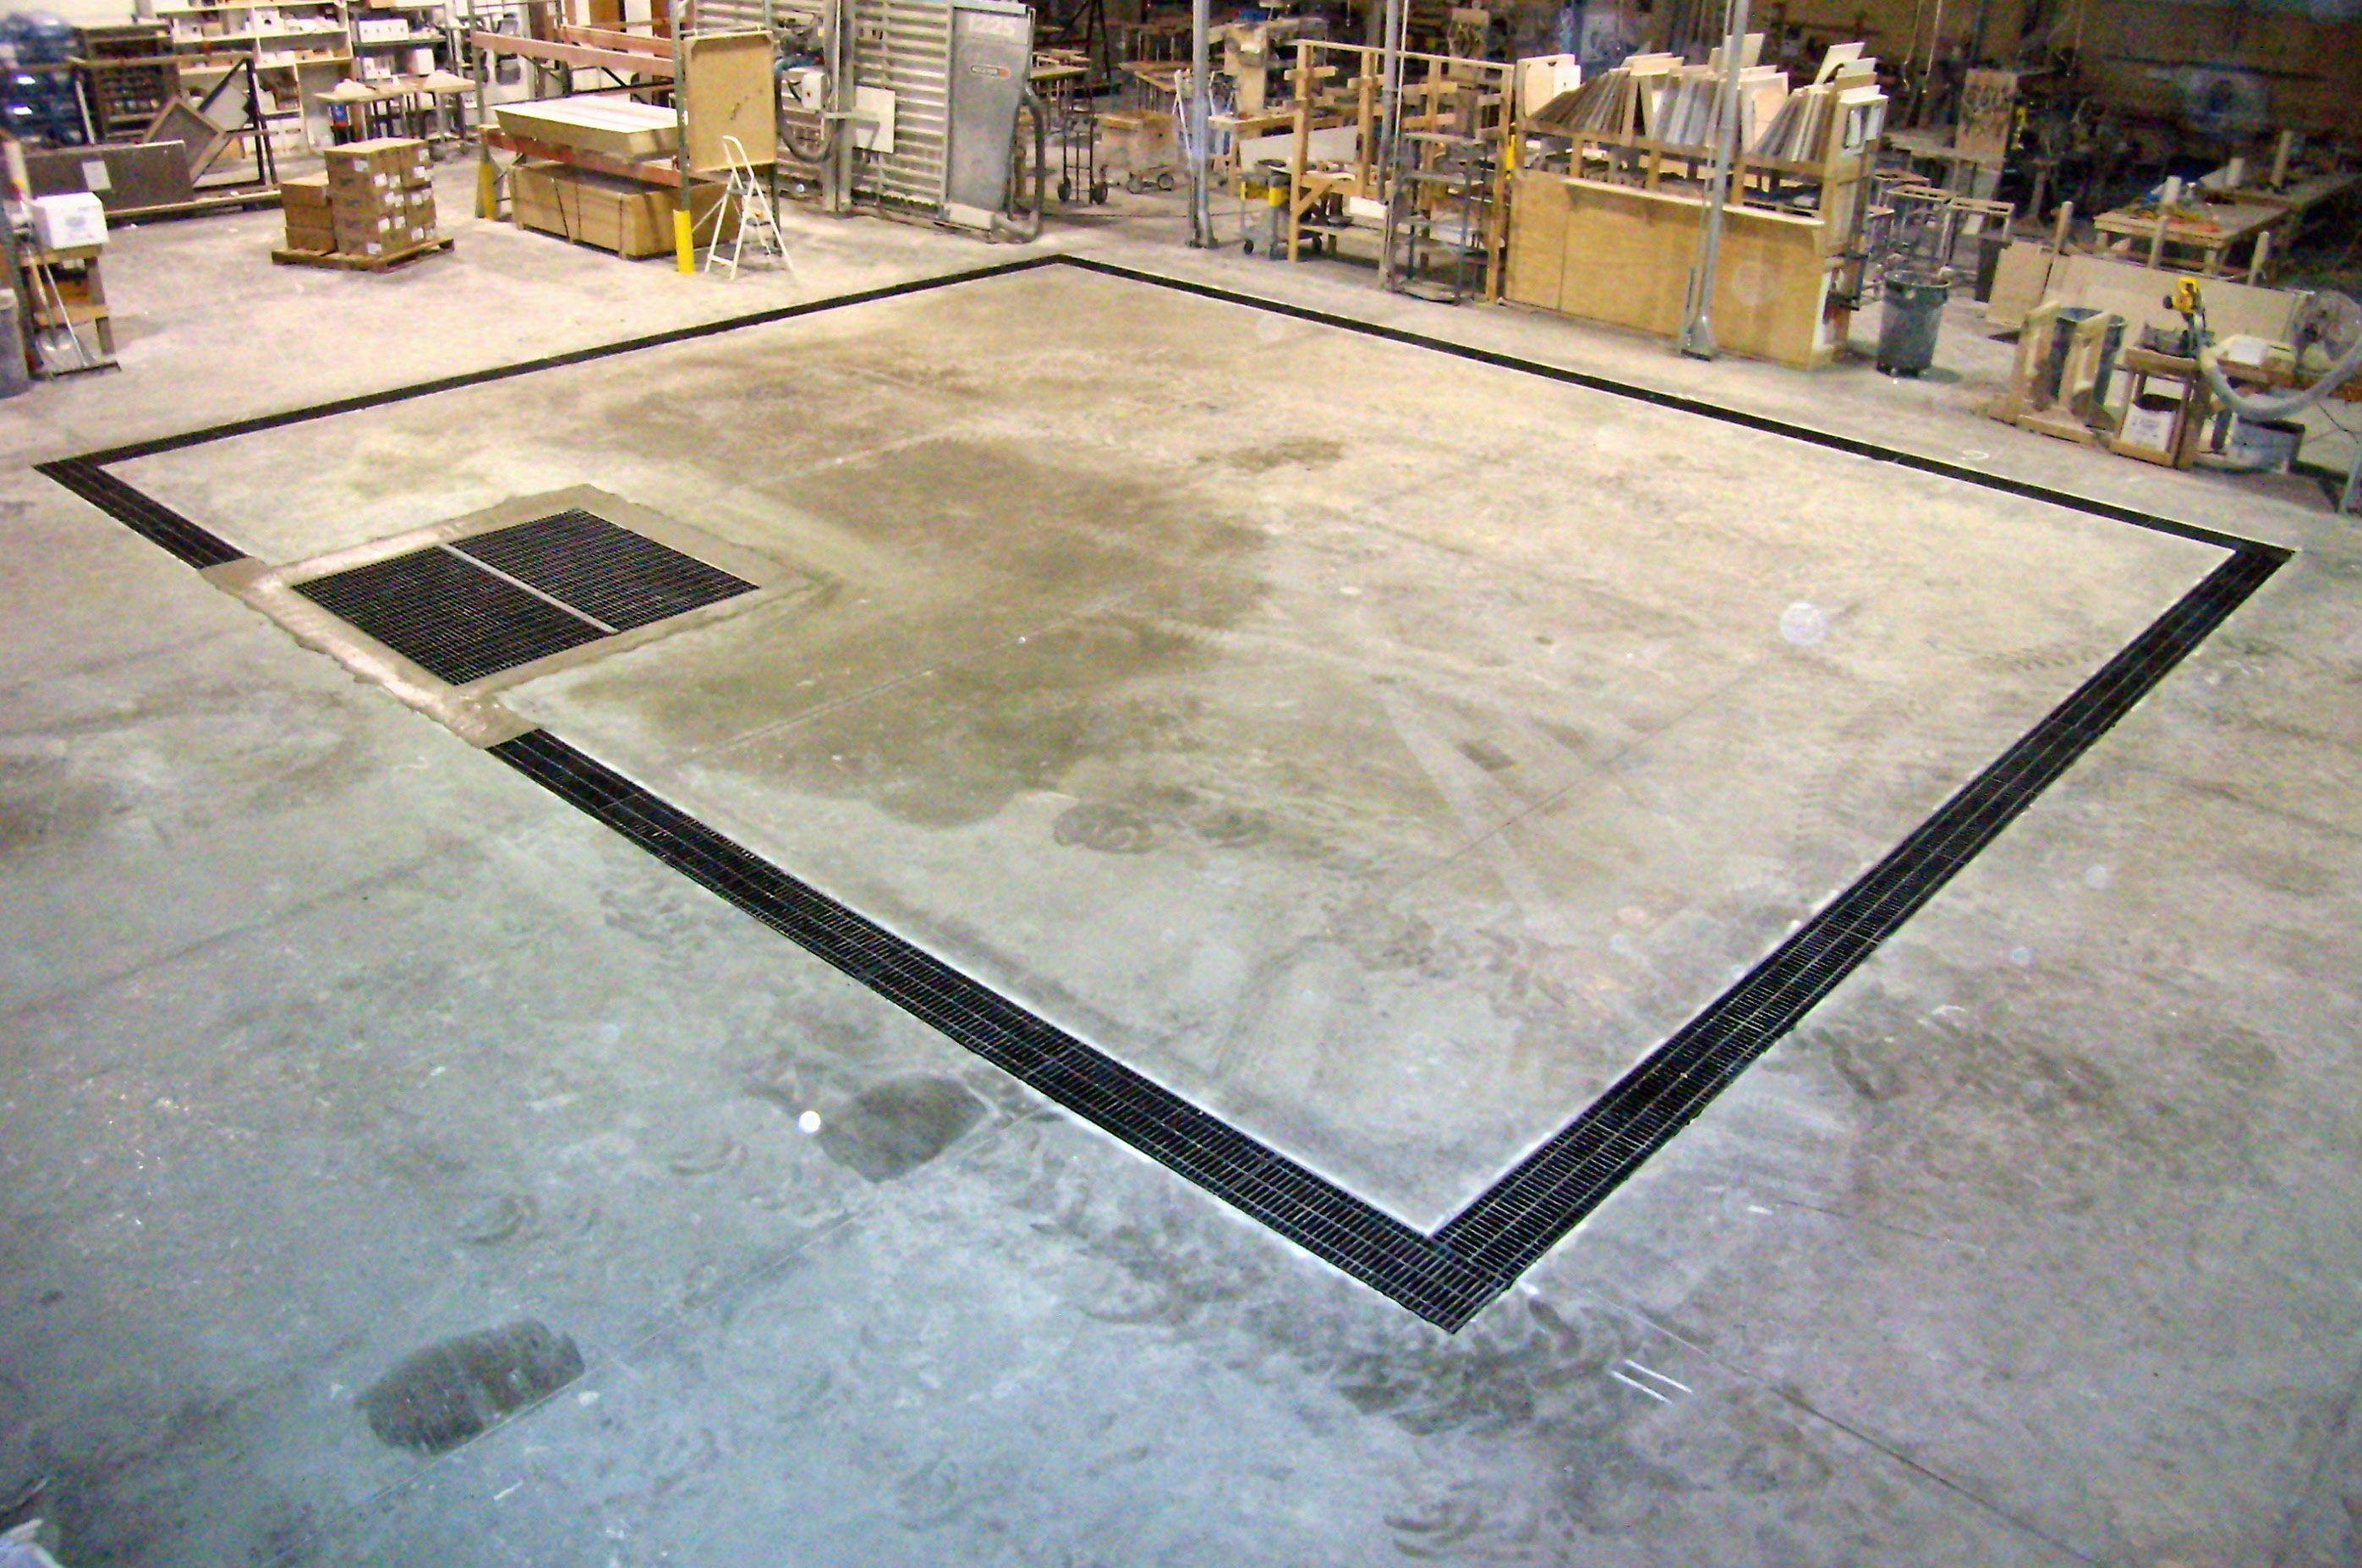 Garage Floor Drain Designs The Better Garages Garage Floor Drain Systems Floor Drains Garage Floor Flooring